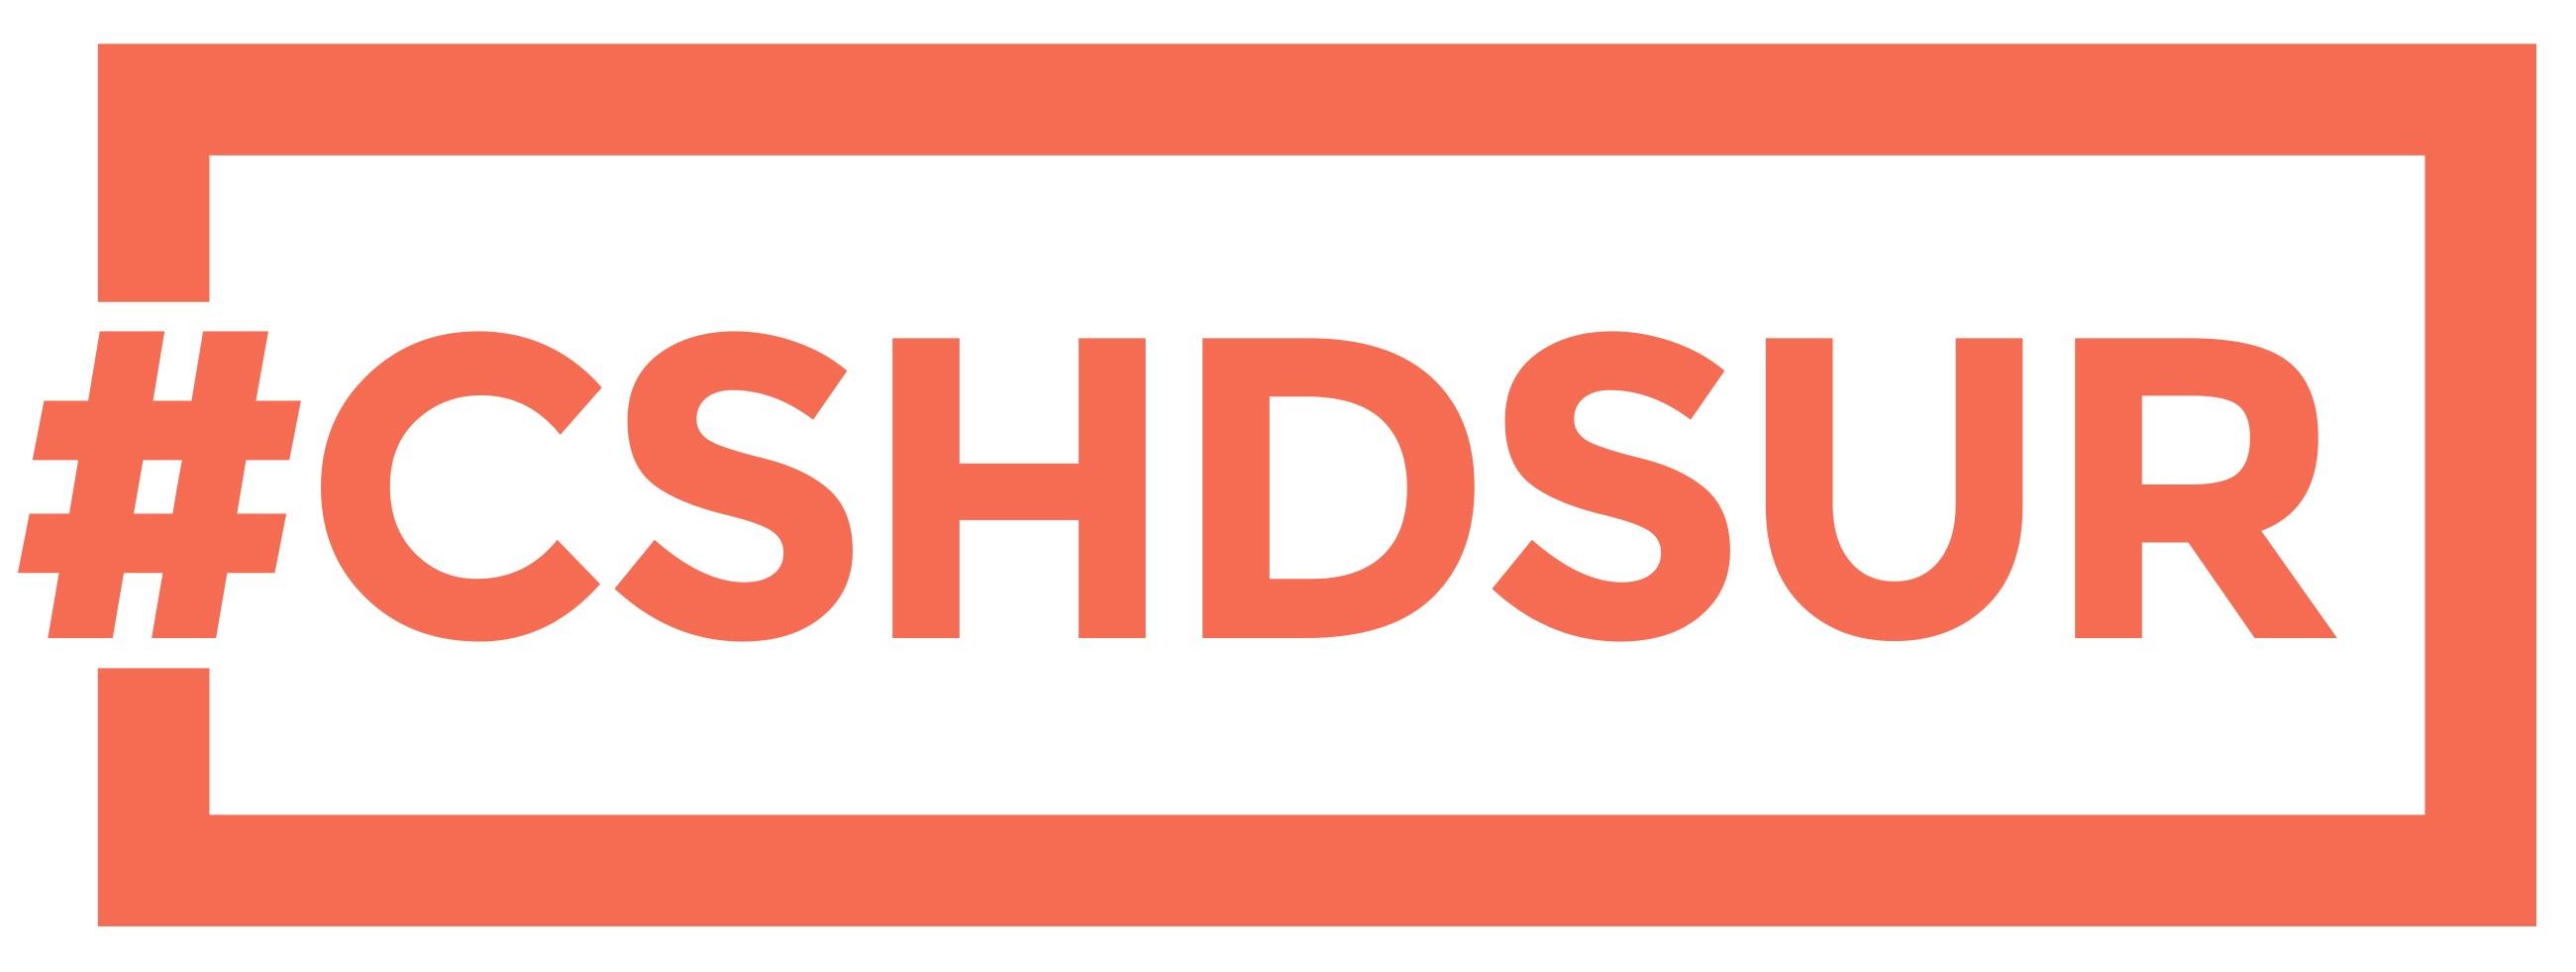 cshdsur